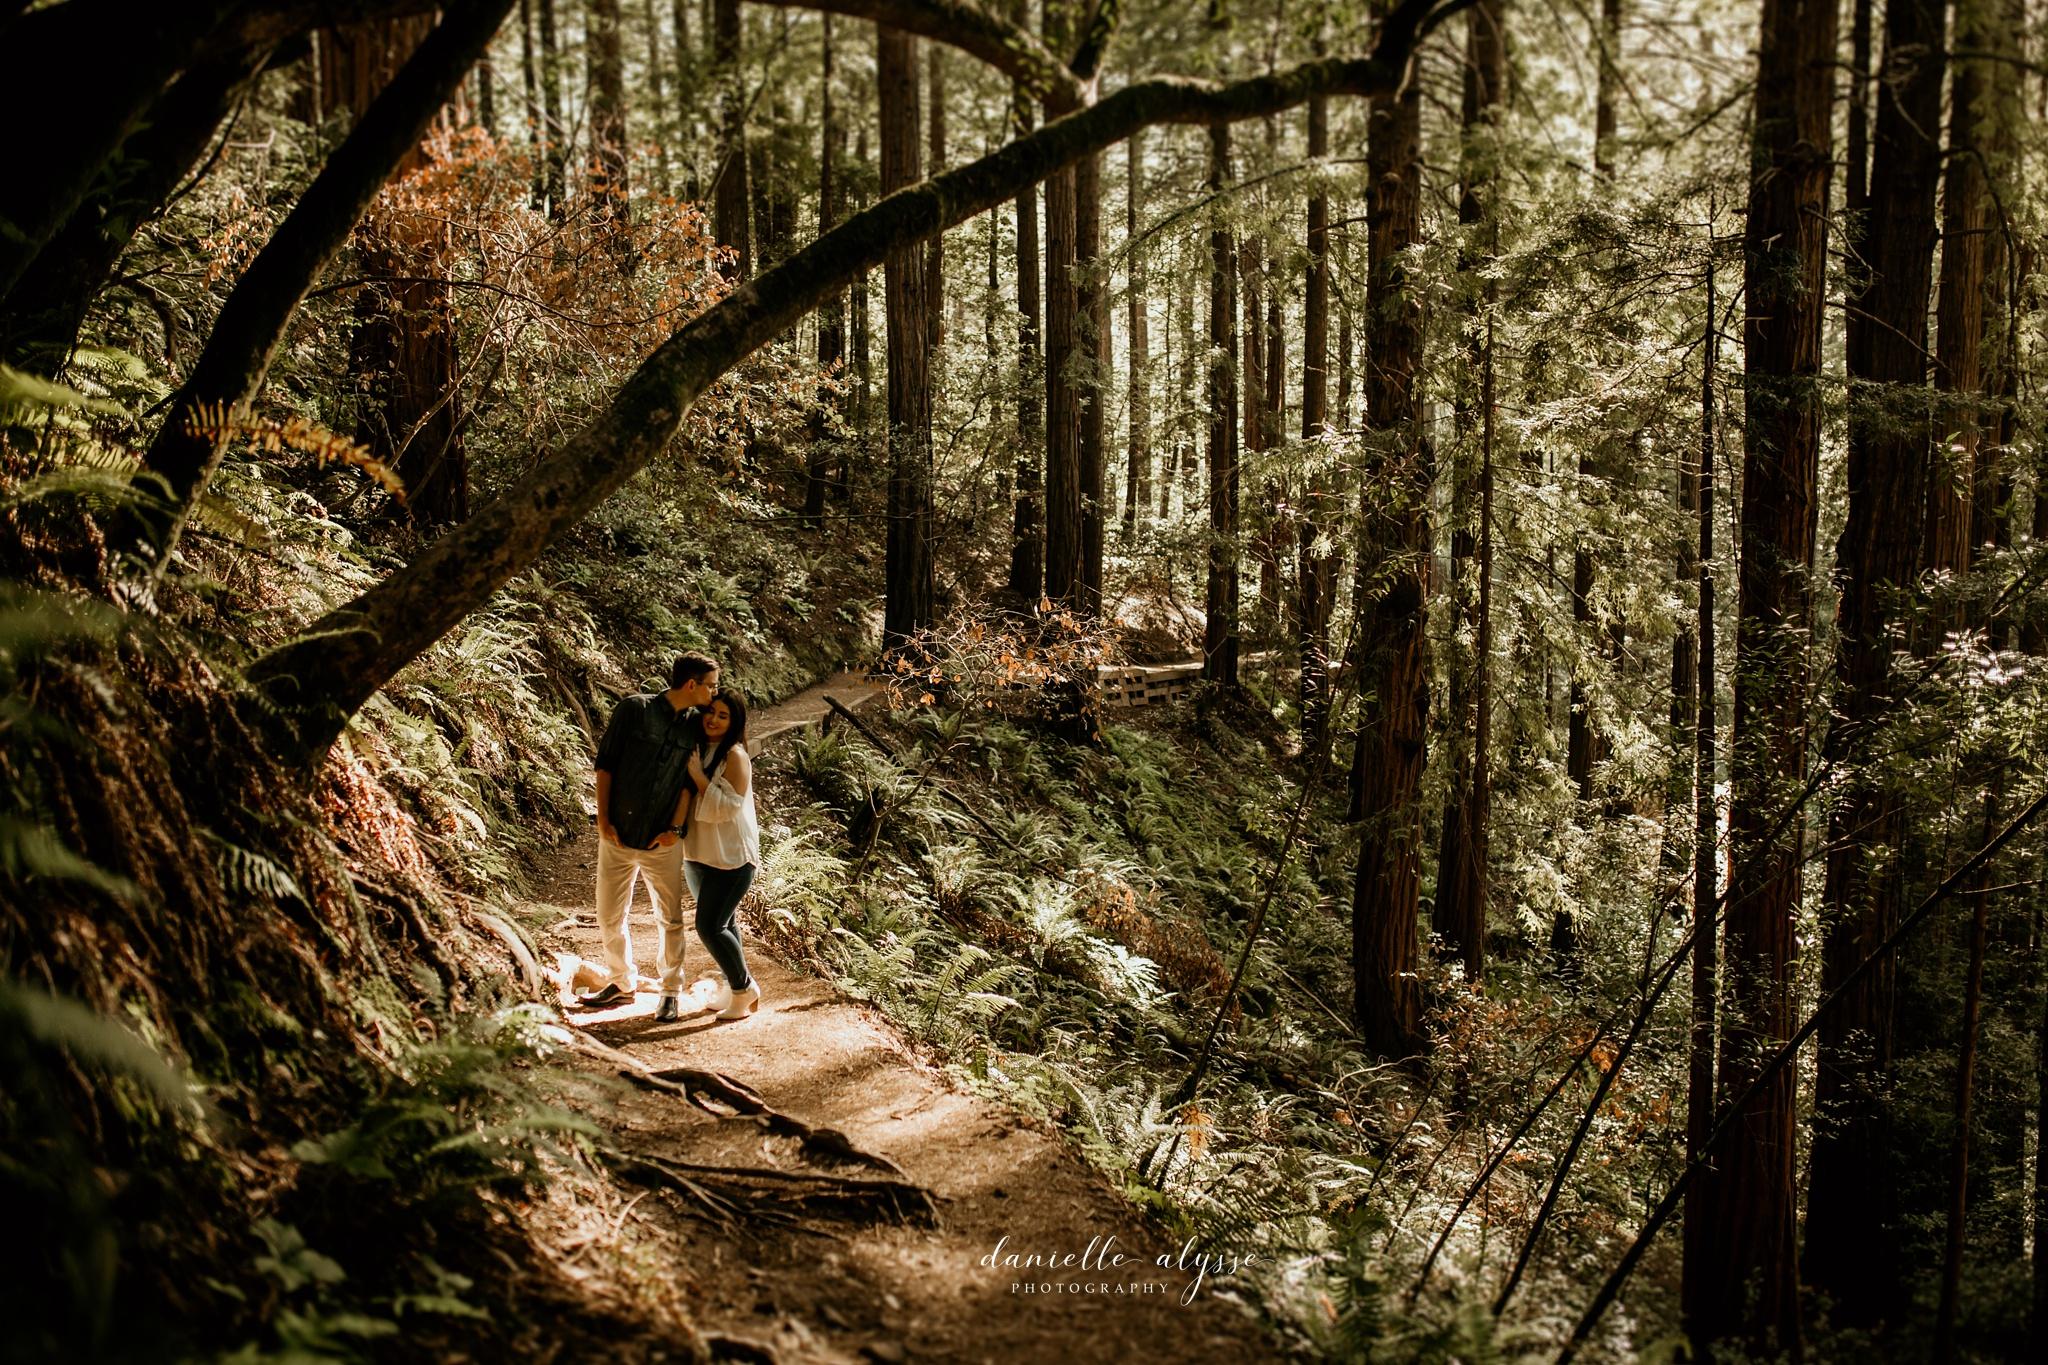 180503_engagement_bianca_muir_woods_mill_valley_danielle_alysse_photography_bay_area_photographer_blog_20_WEB.jpg